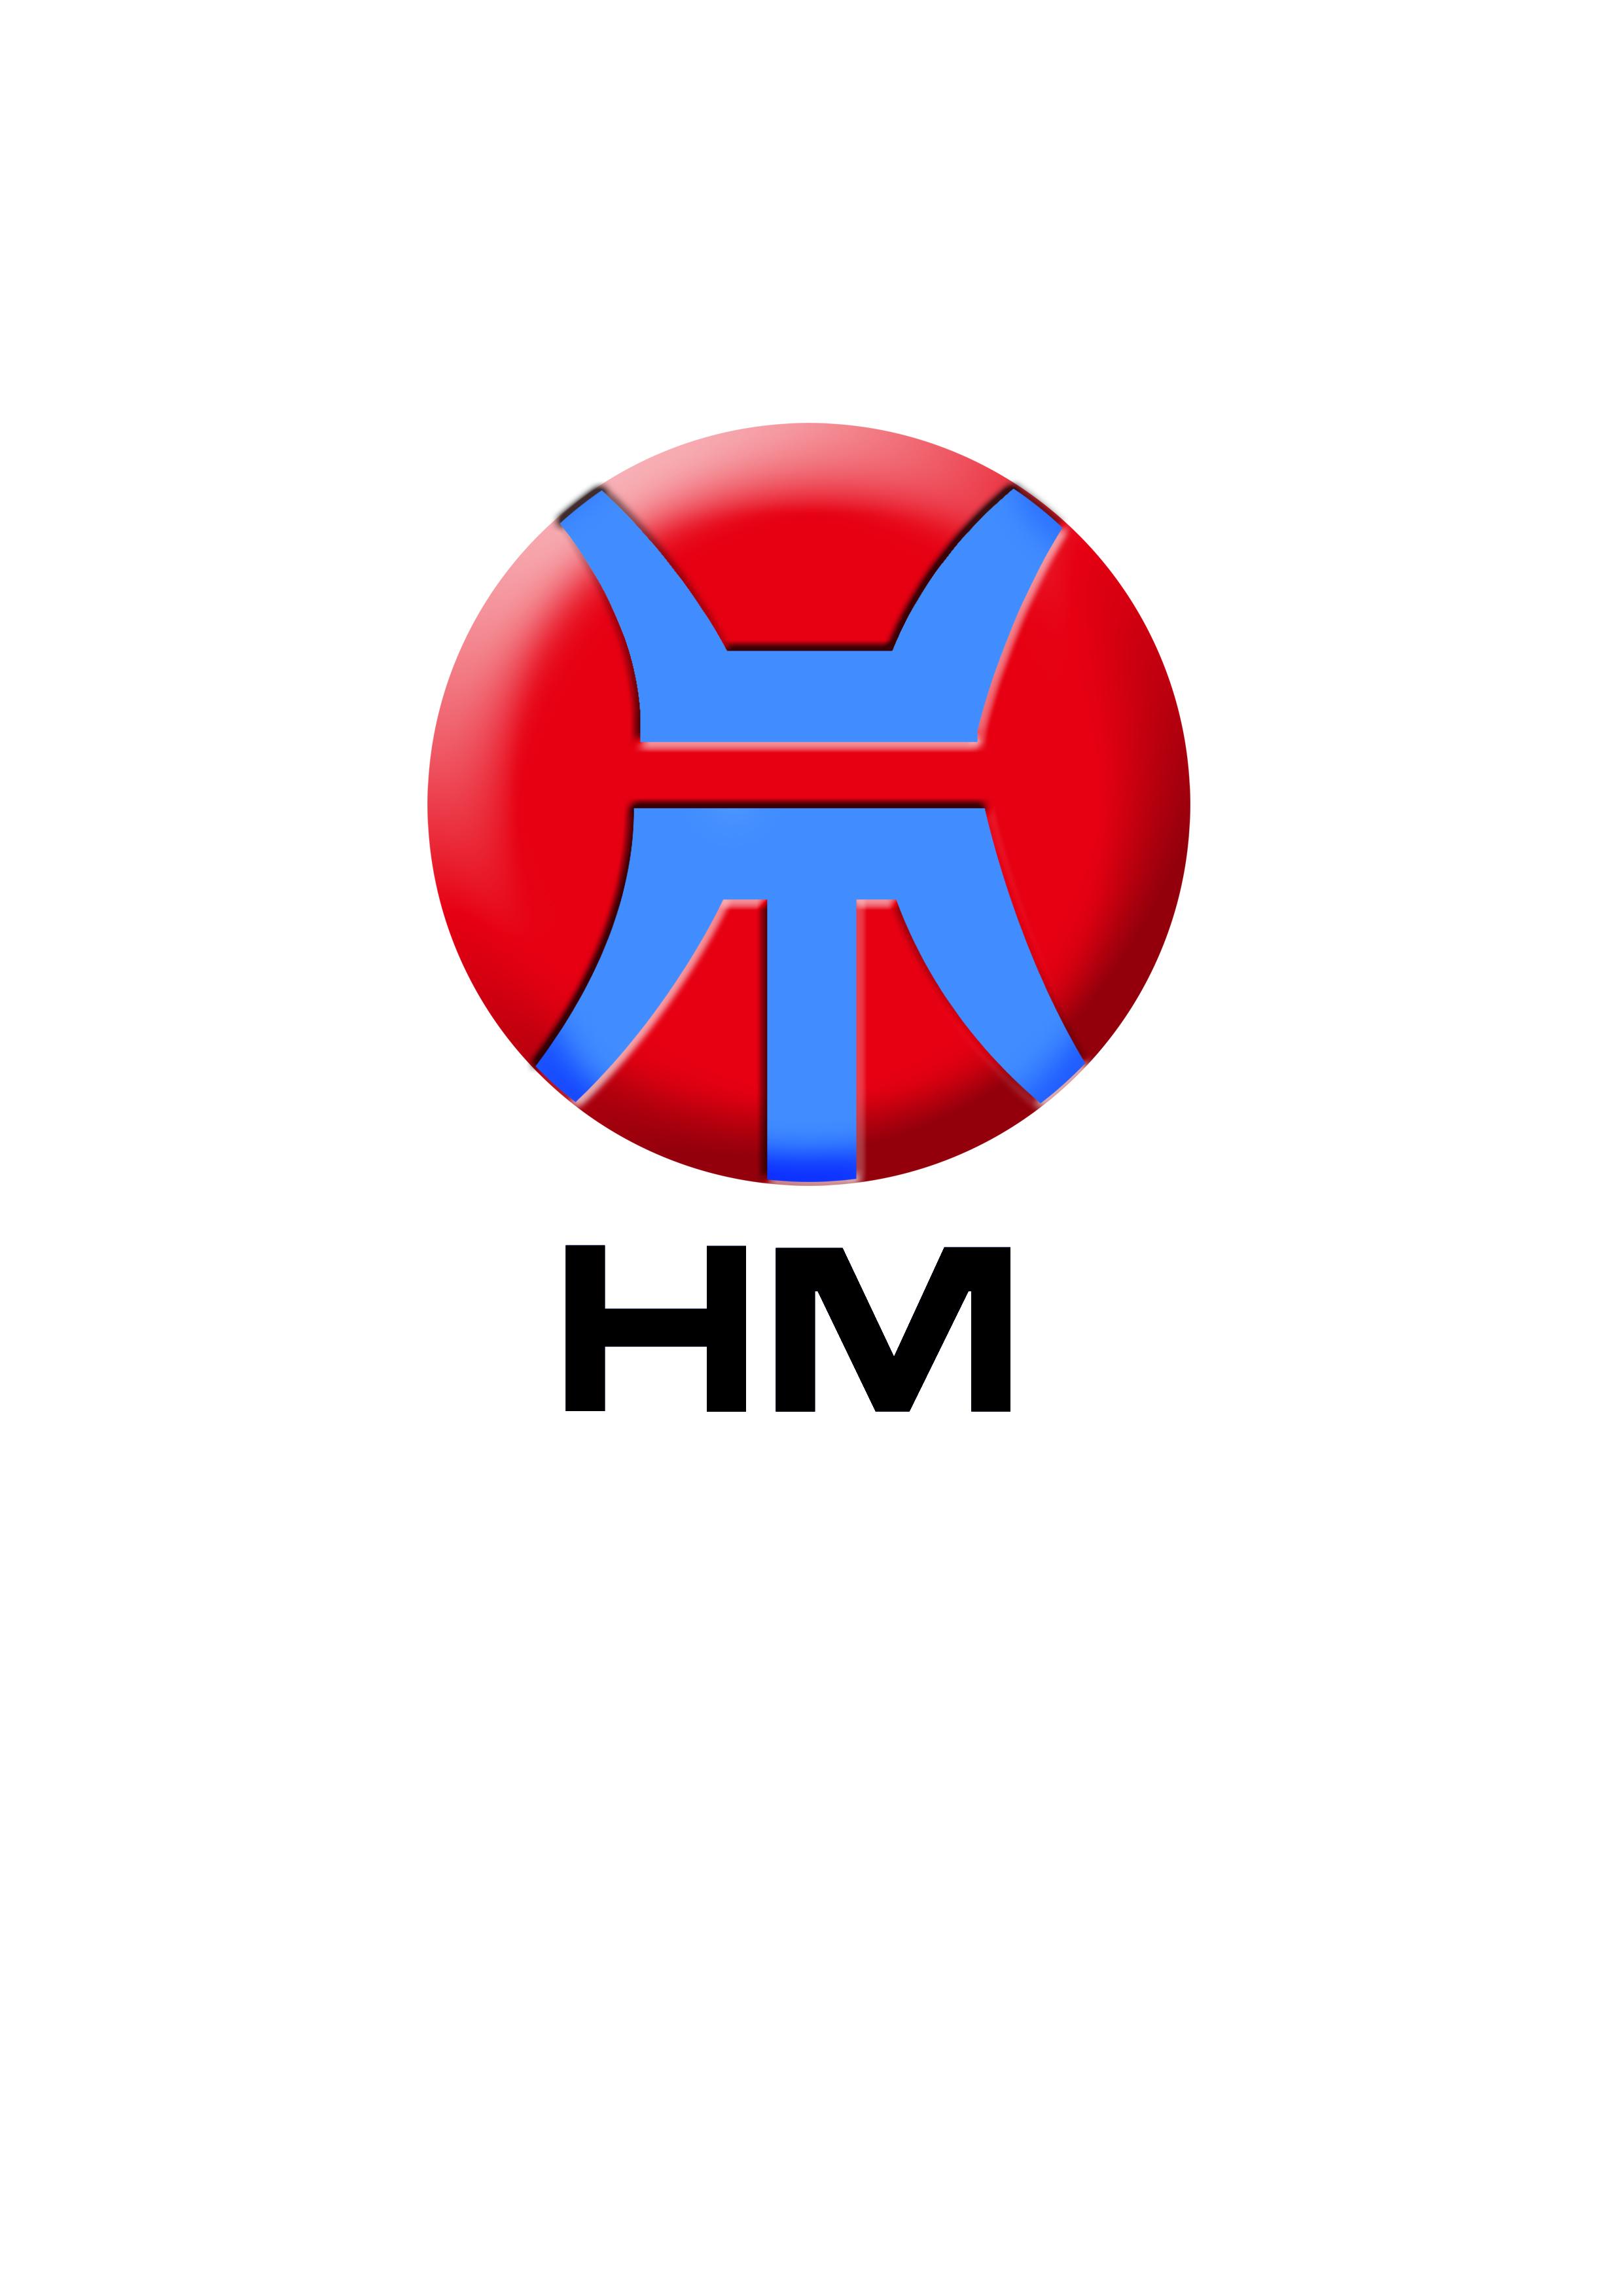 hm公司logo设计- 稿件[#2563075]